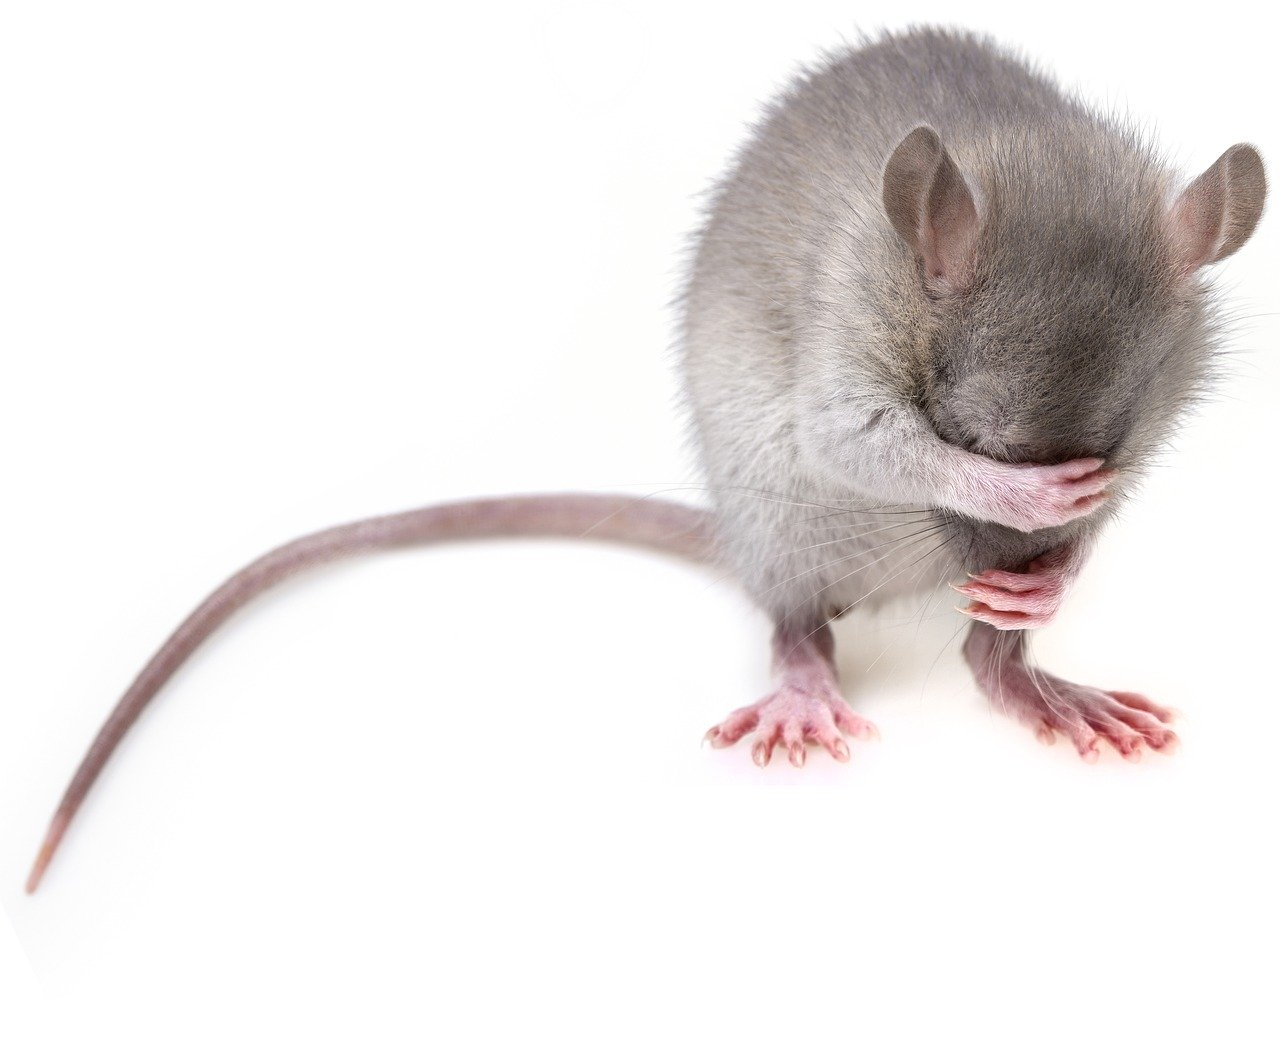 mouse, rodent, rat